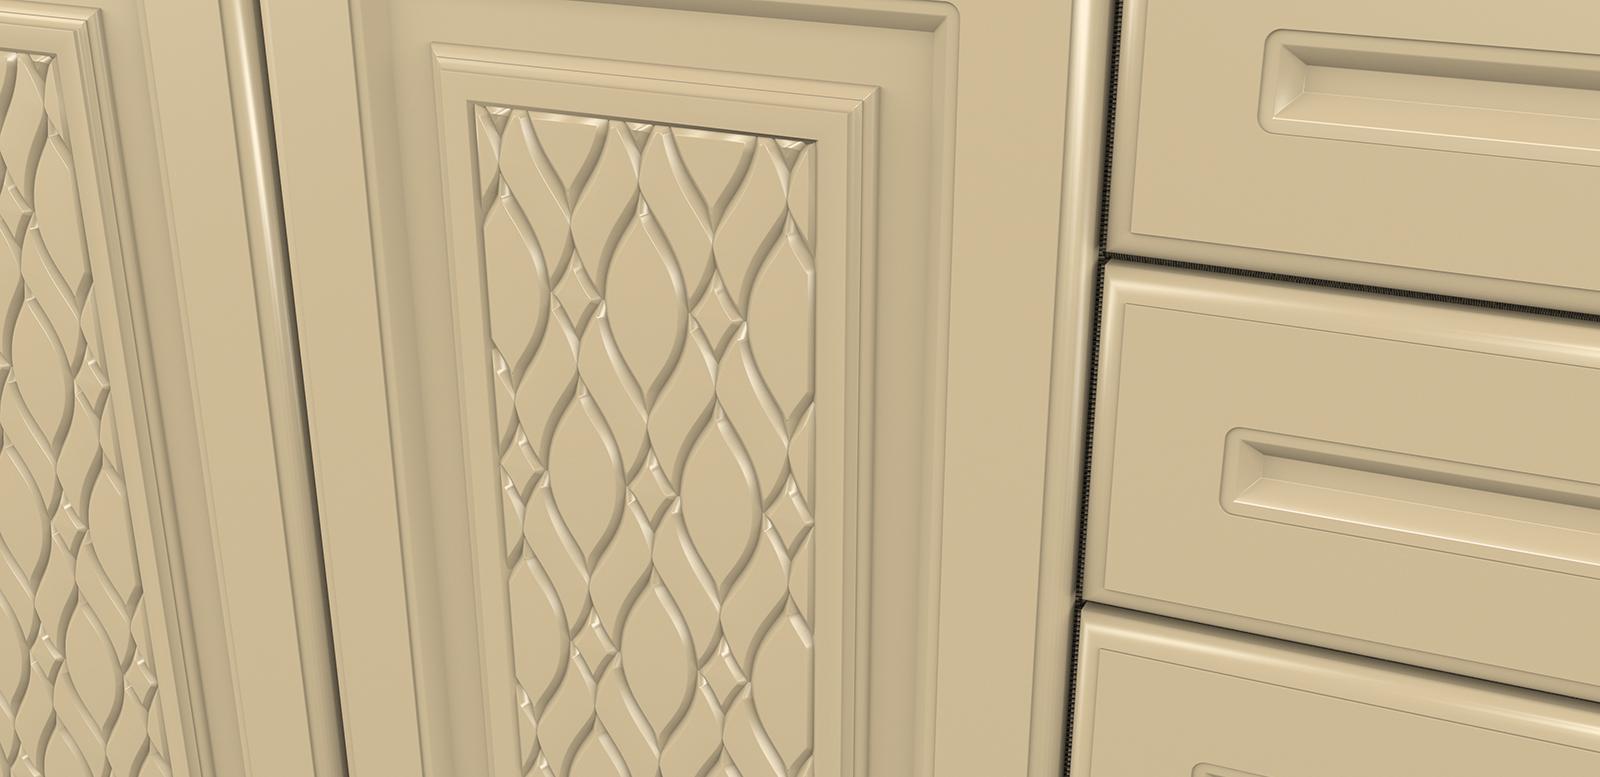 Fronturi MDF frezate - Colectia Pattern - SOFIA